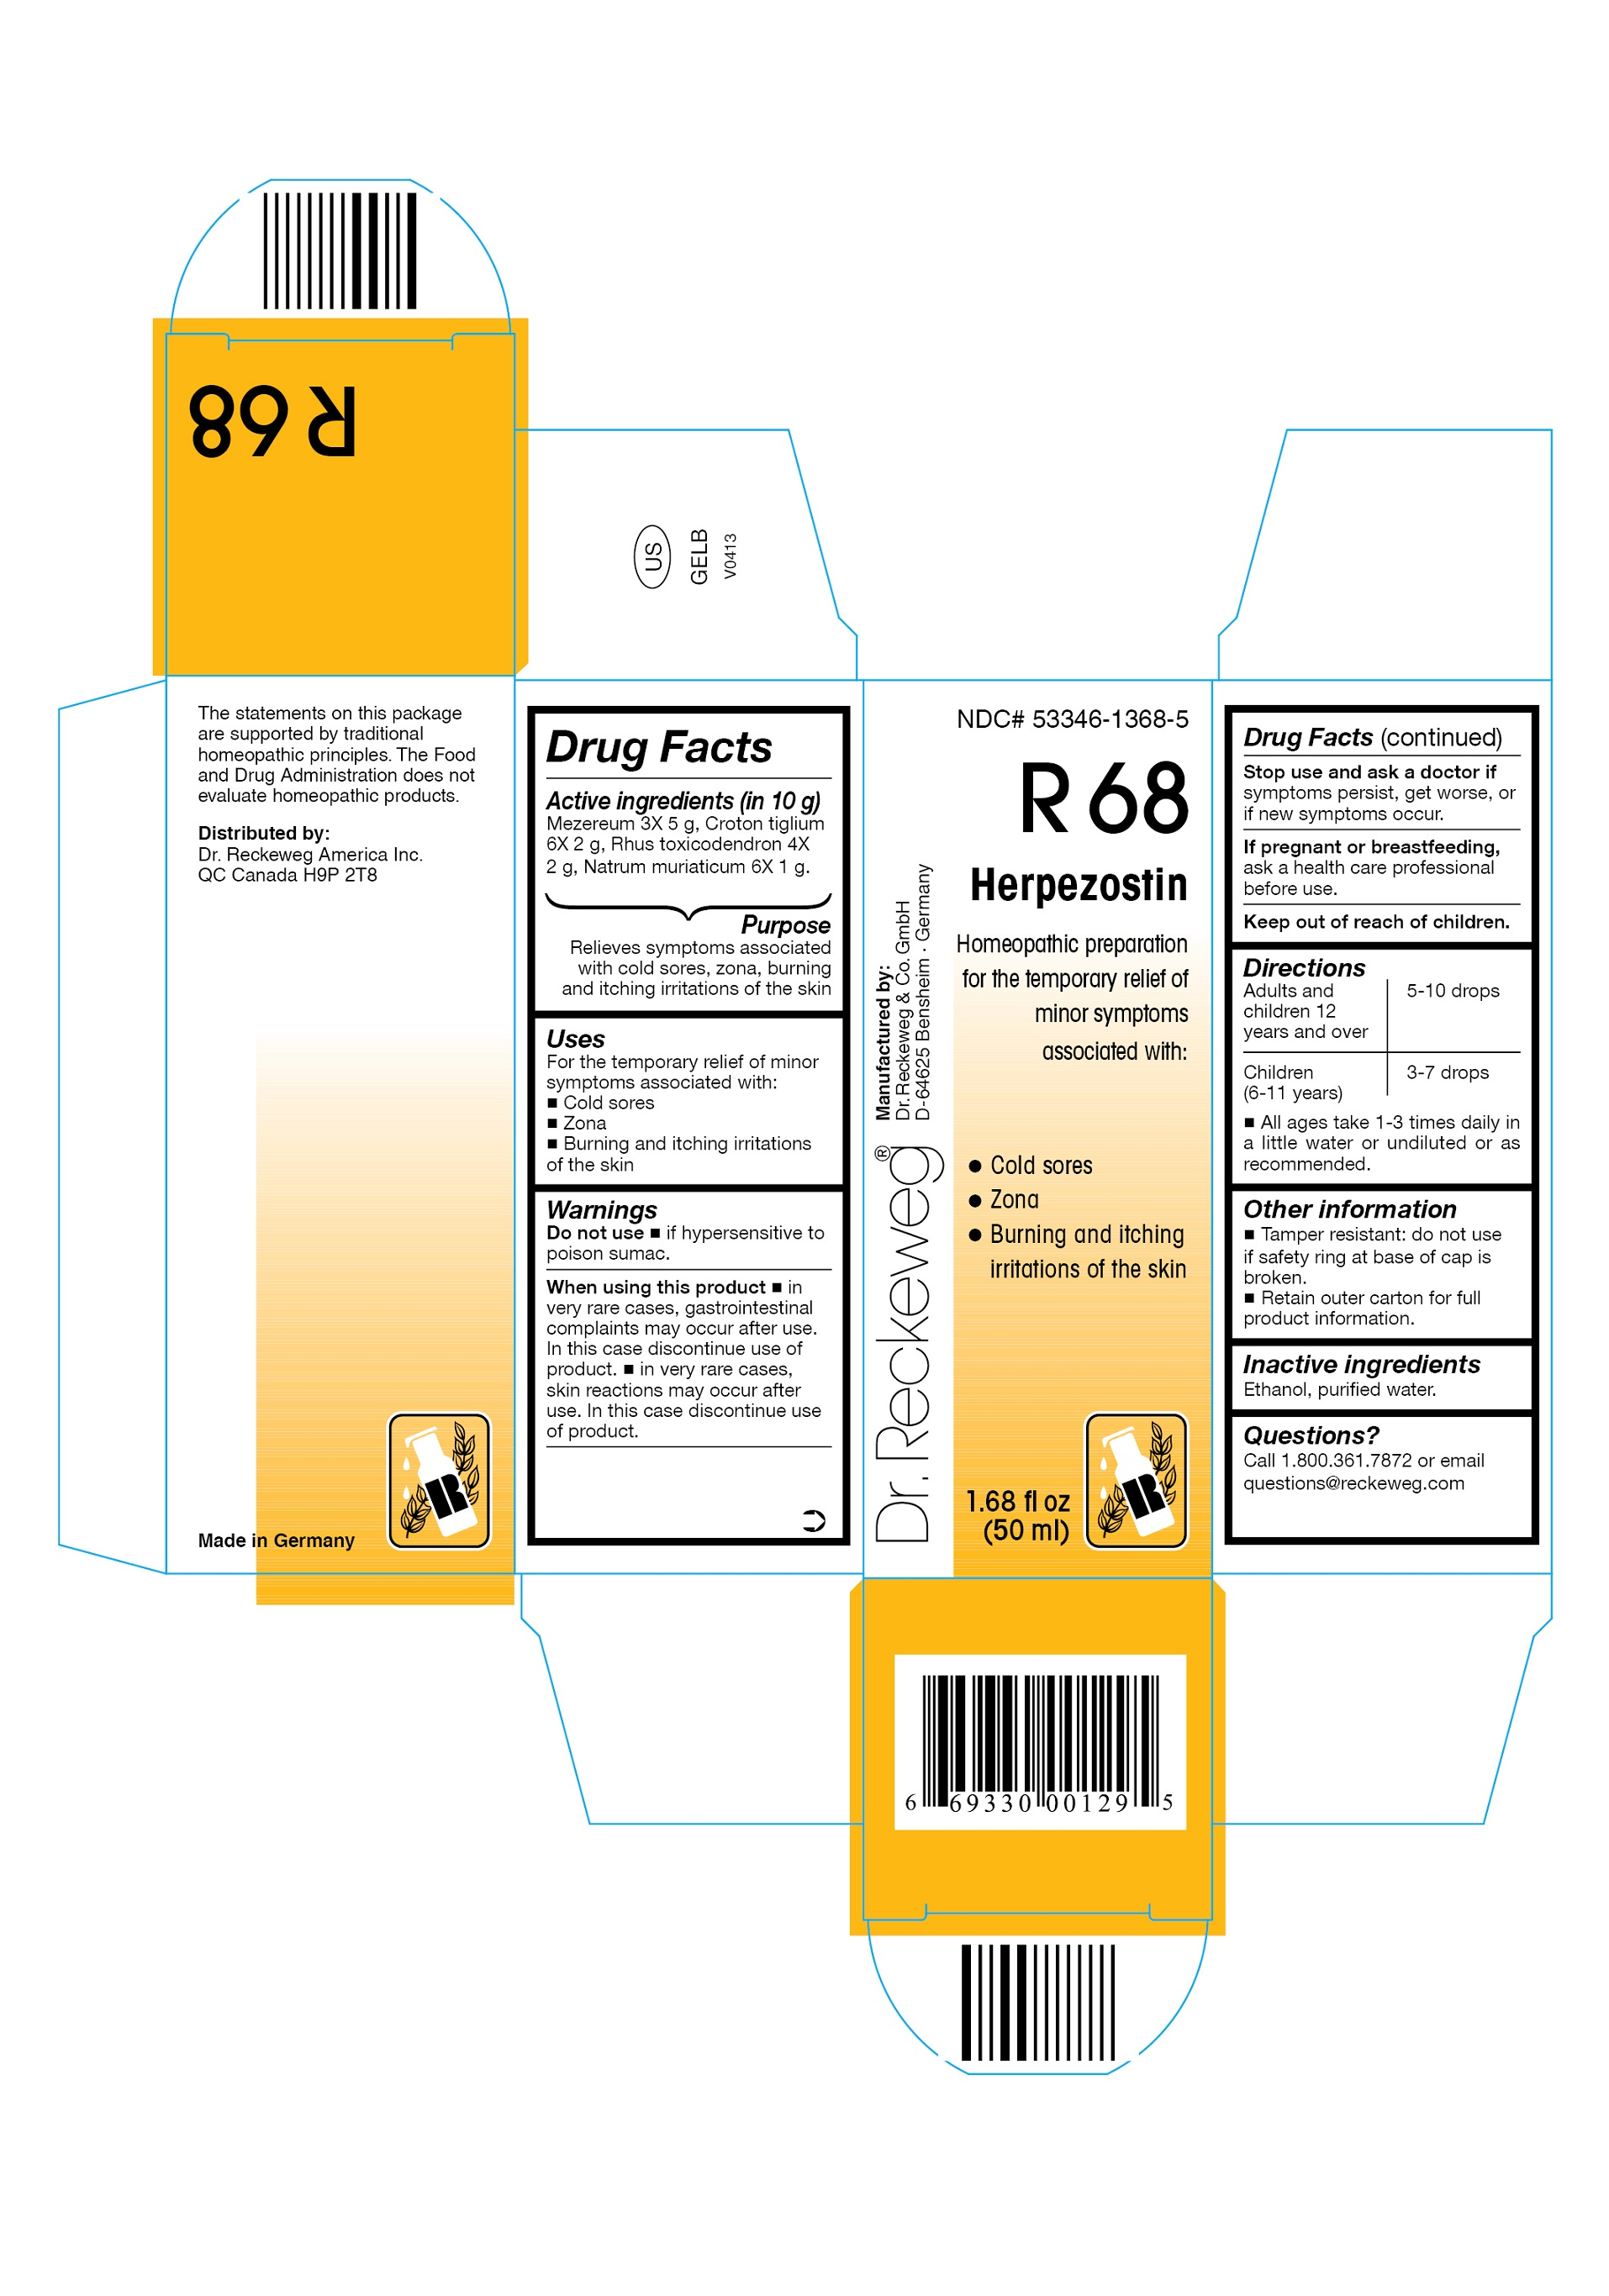 Dr. Reckeweg R68 Herpezostin Combination Product (Mezereum 3x, Croton Tiglium 6x, Rhus Toxicodendron 4x, Natrum Muriaticum 6x) Liquid [Pharmazeutische Fabrik Dr. Reckeweg & Co]